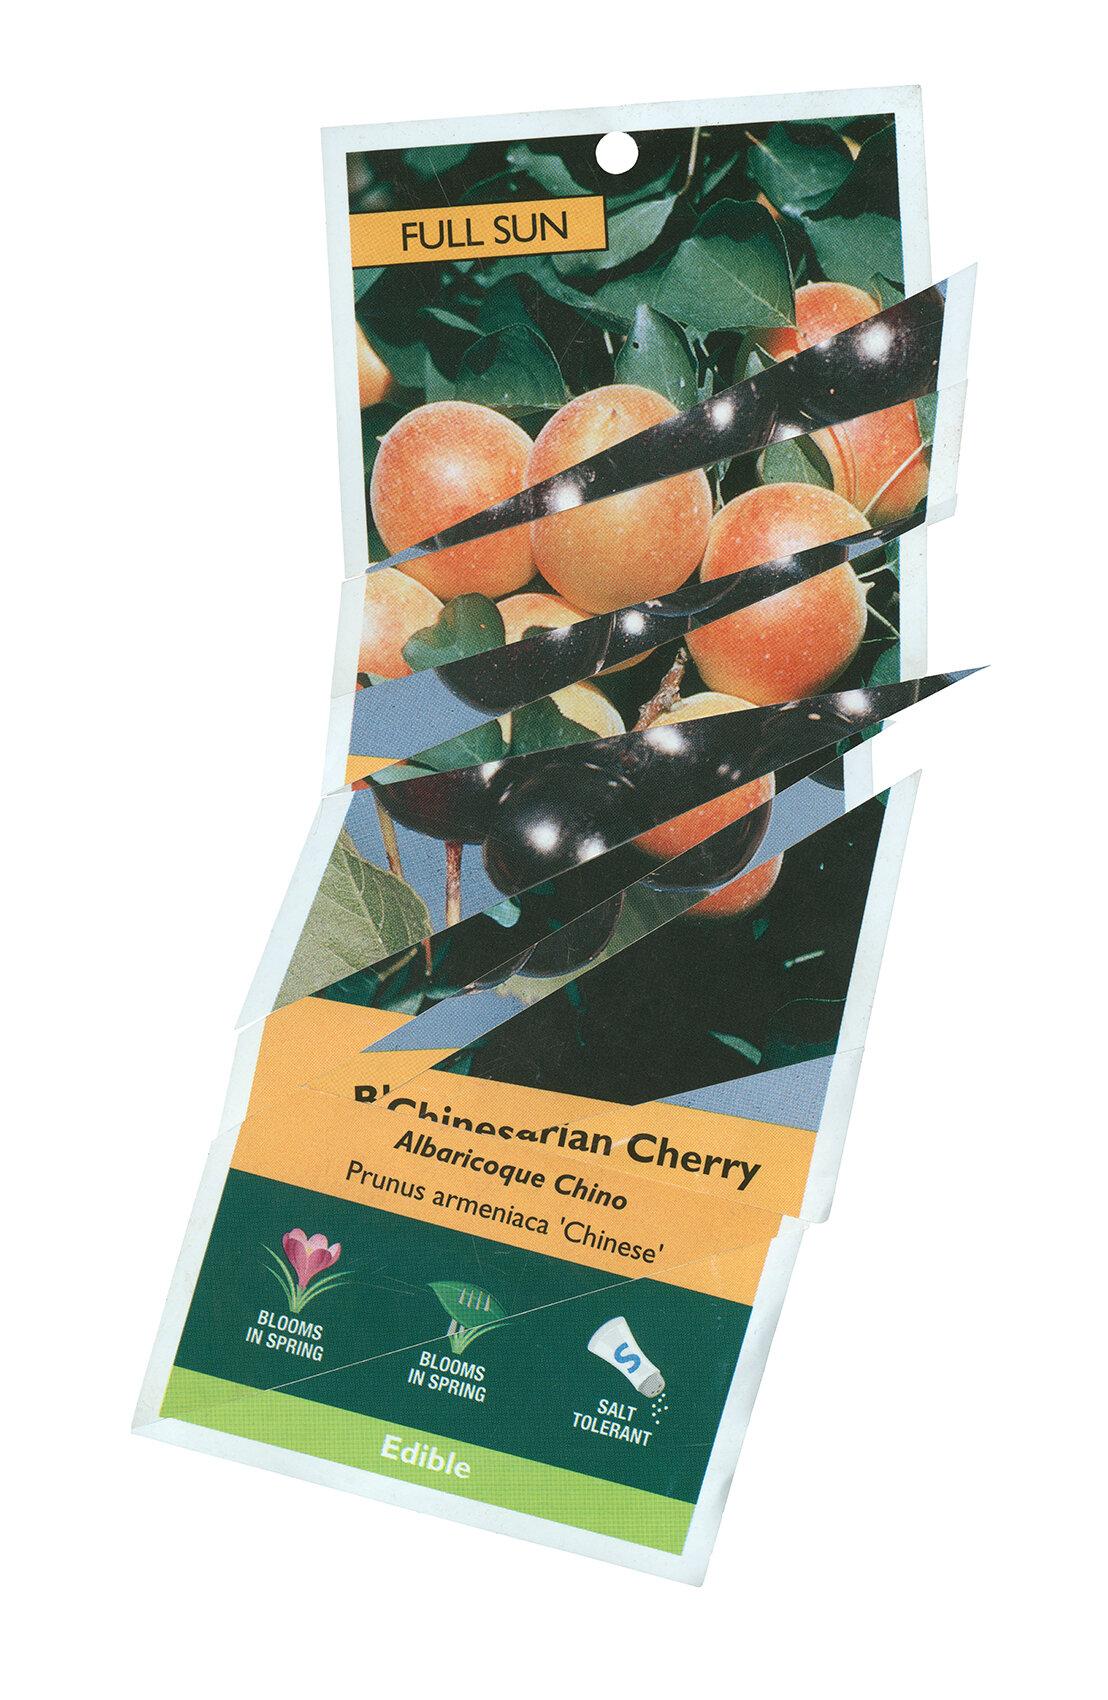 Chinese Apricot-Black Tartarian (22x34).jpg